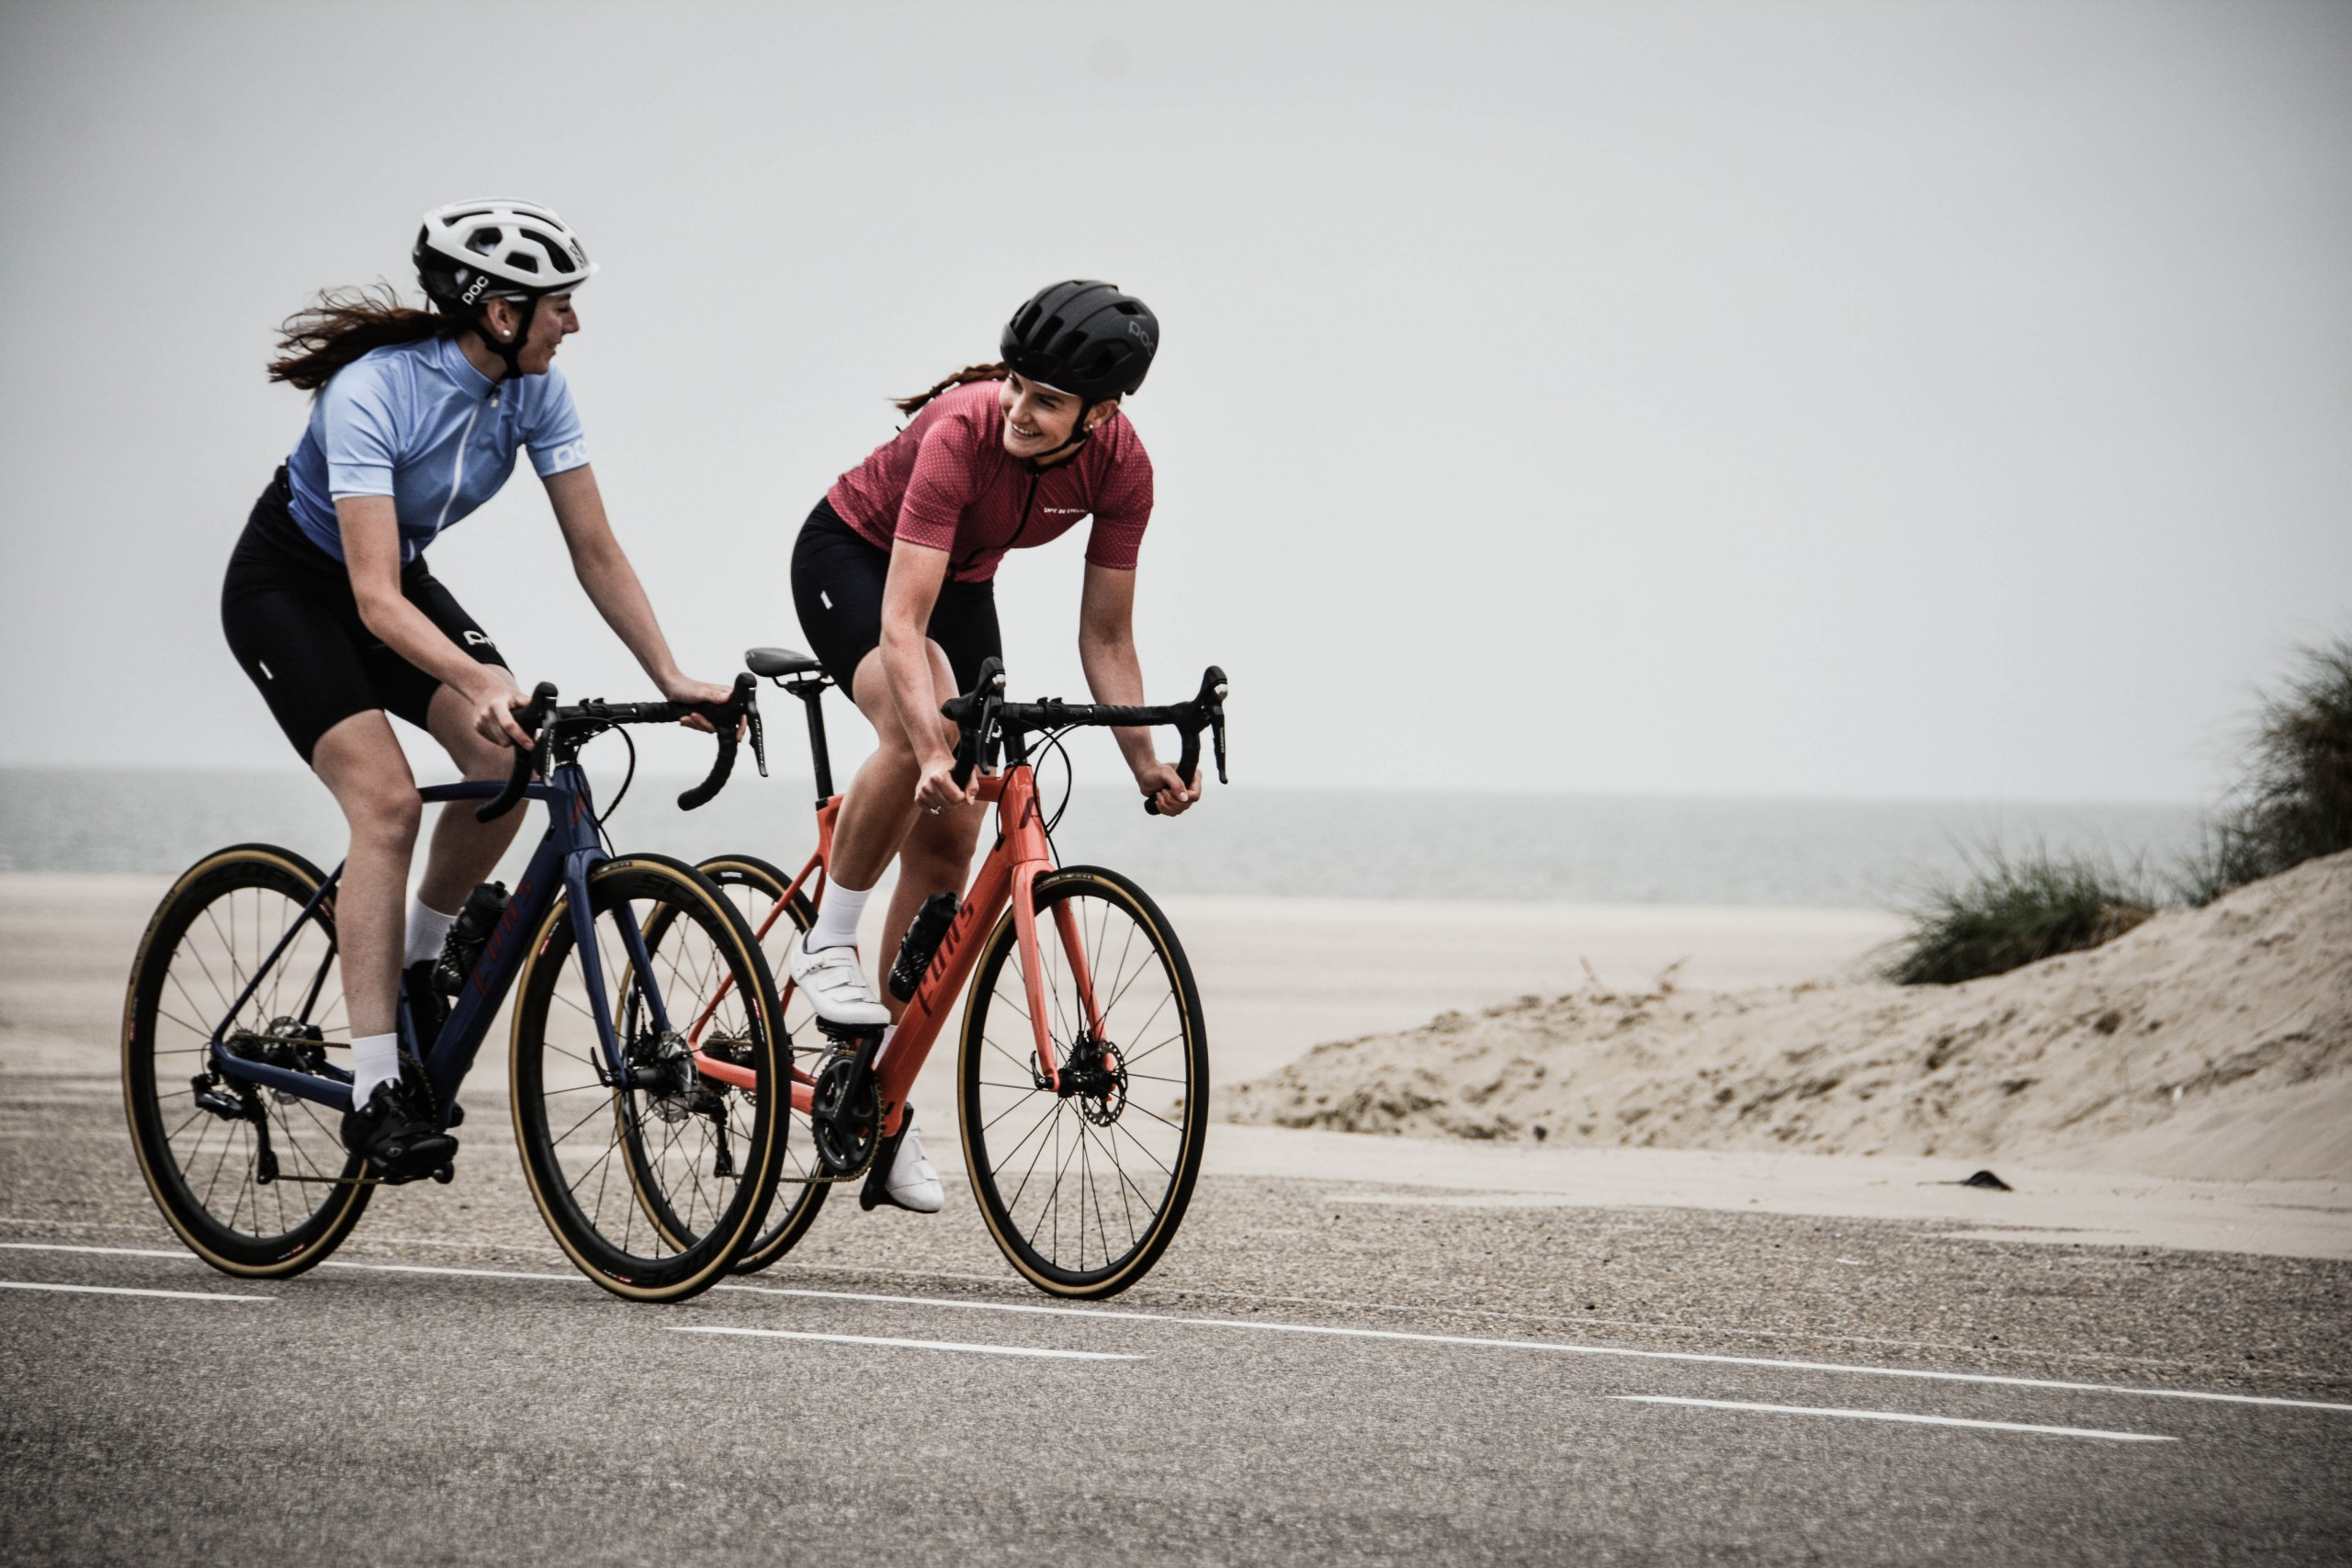 man and woman riding road bikes at the road near shore